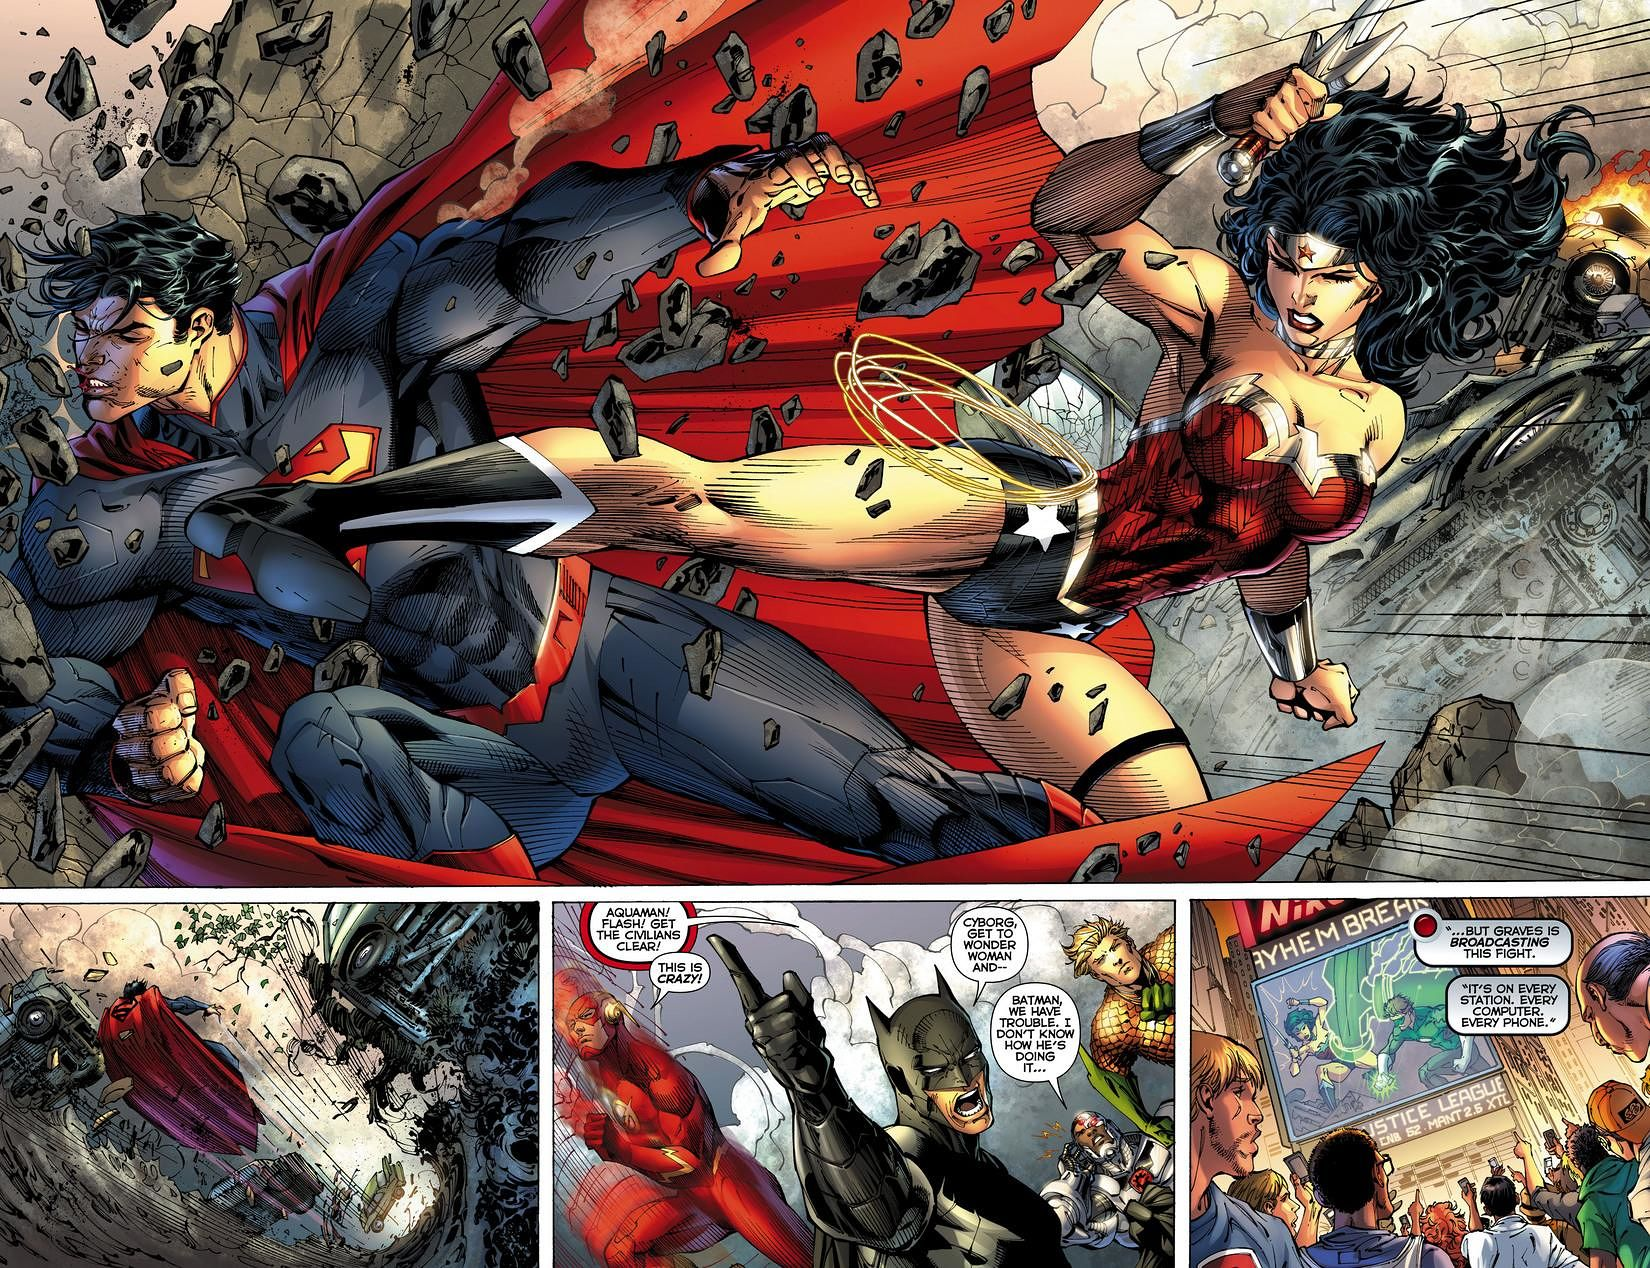 catwoman-black-widow-or-wonder-woman-top-10-female-comic-book-characters-65235f94-fe0b-4a6c-aa3d-4dc3ee01297e-jpeg-114216